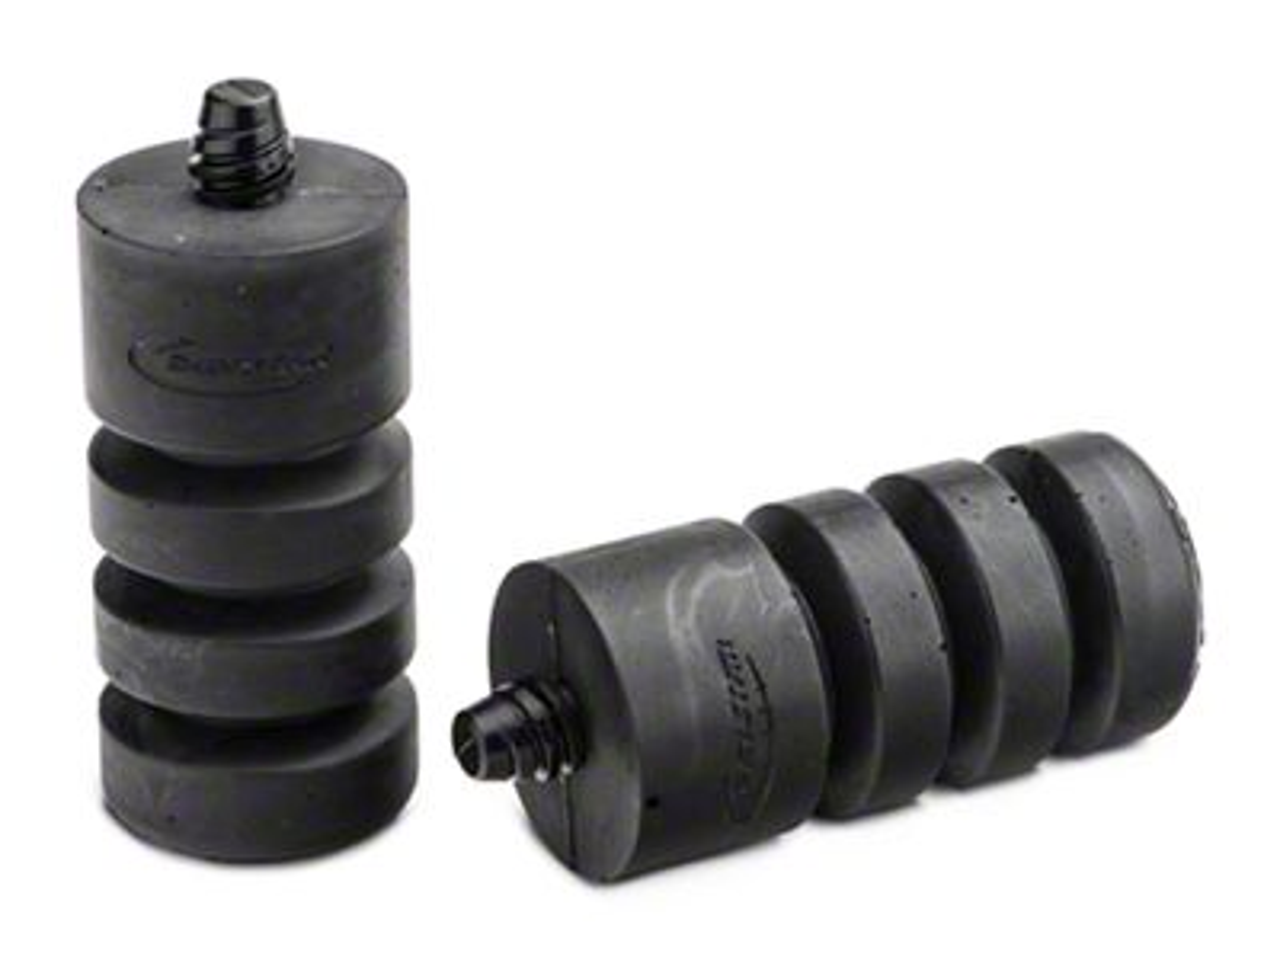 Daystar Tailgate Bump Stop Kit (07-18 Jeep Wrangler JK)